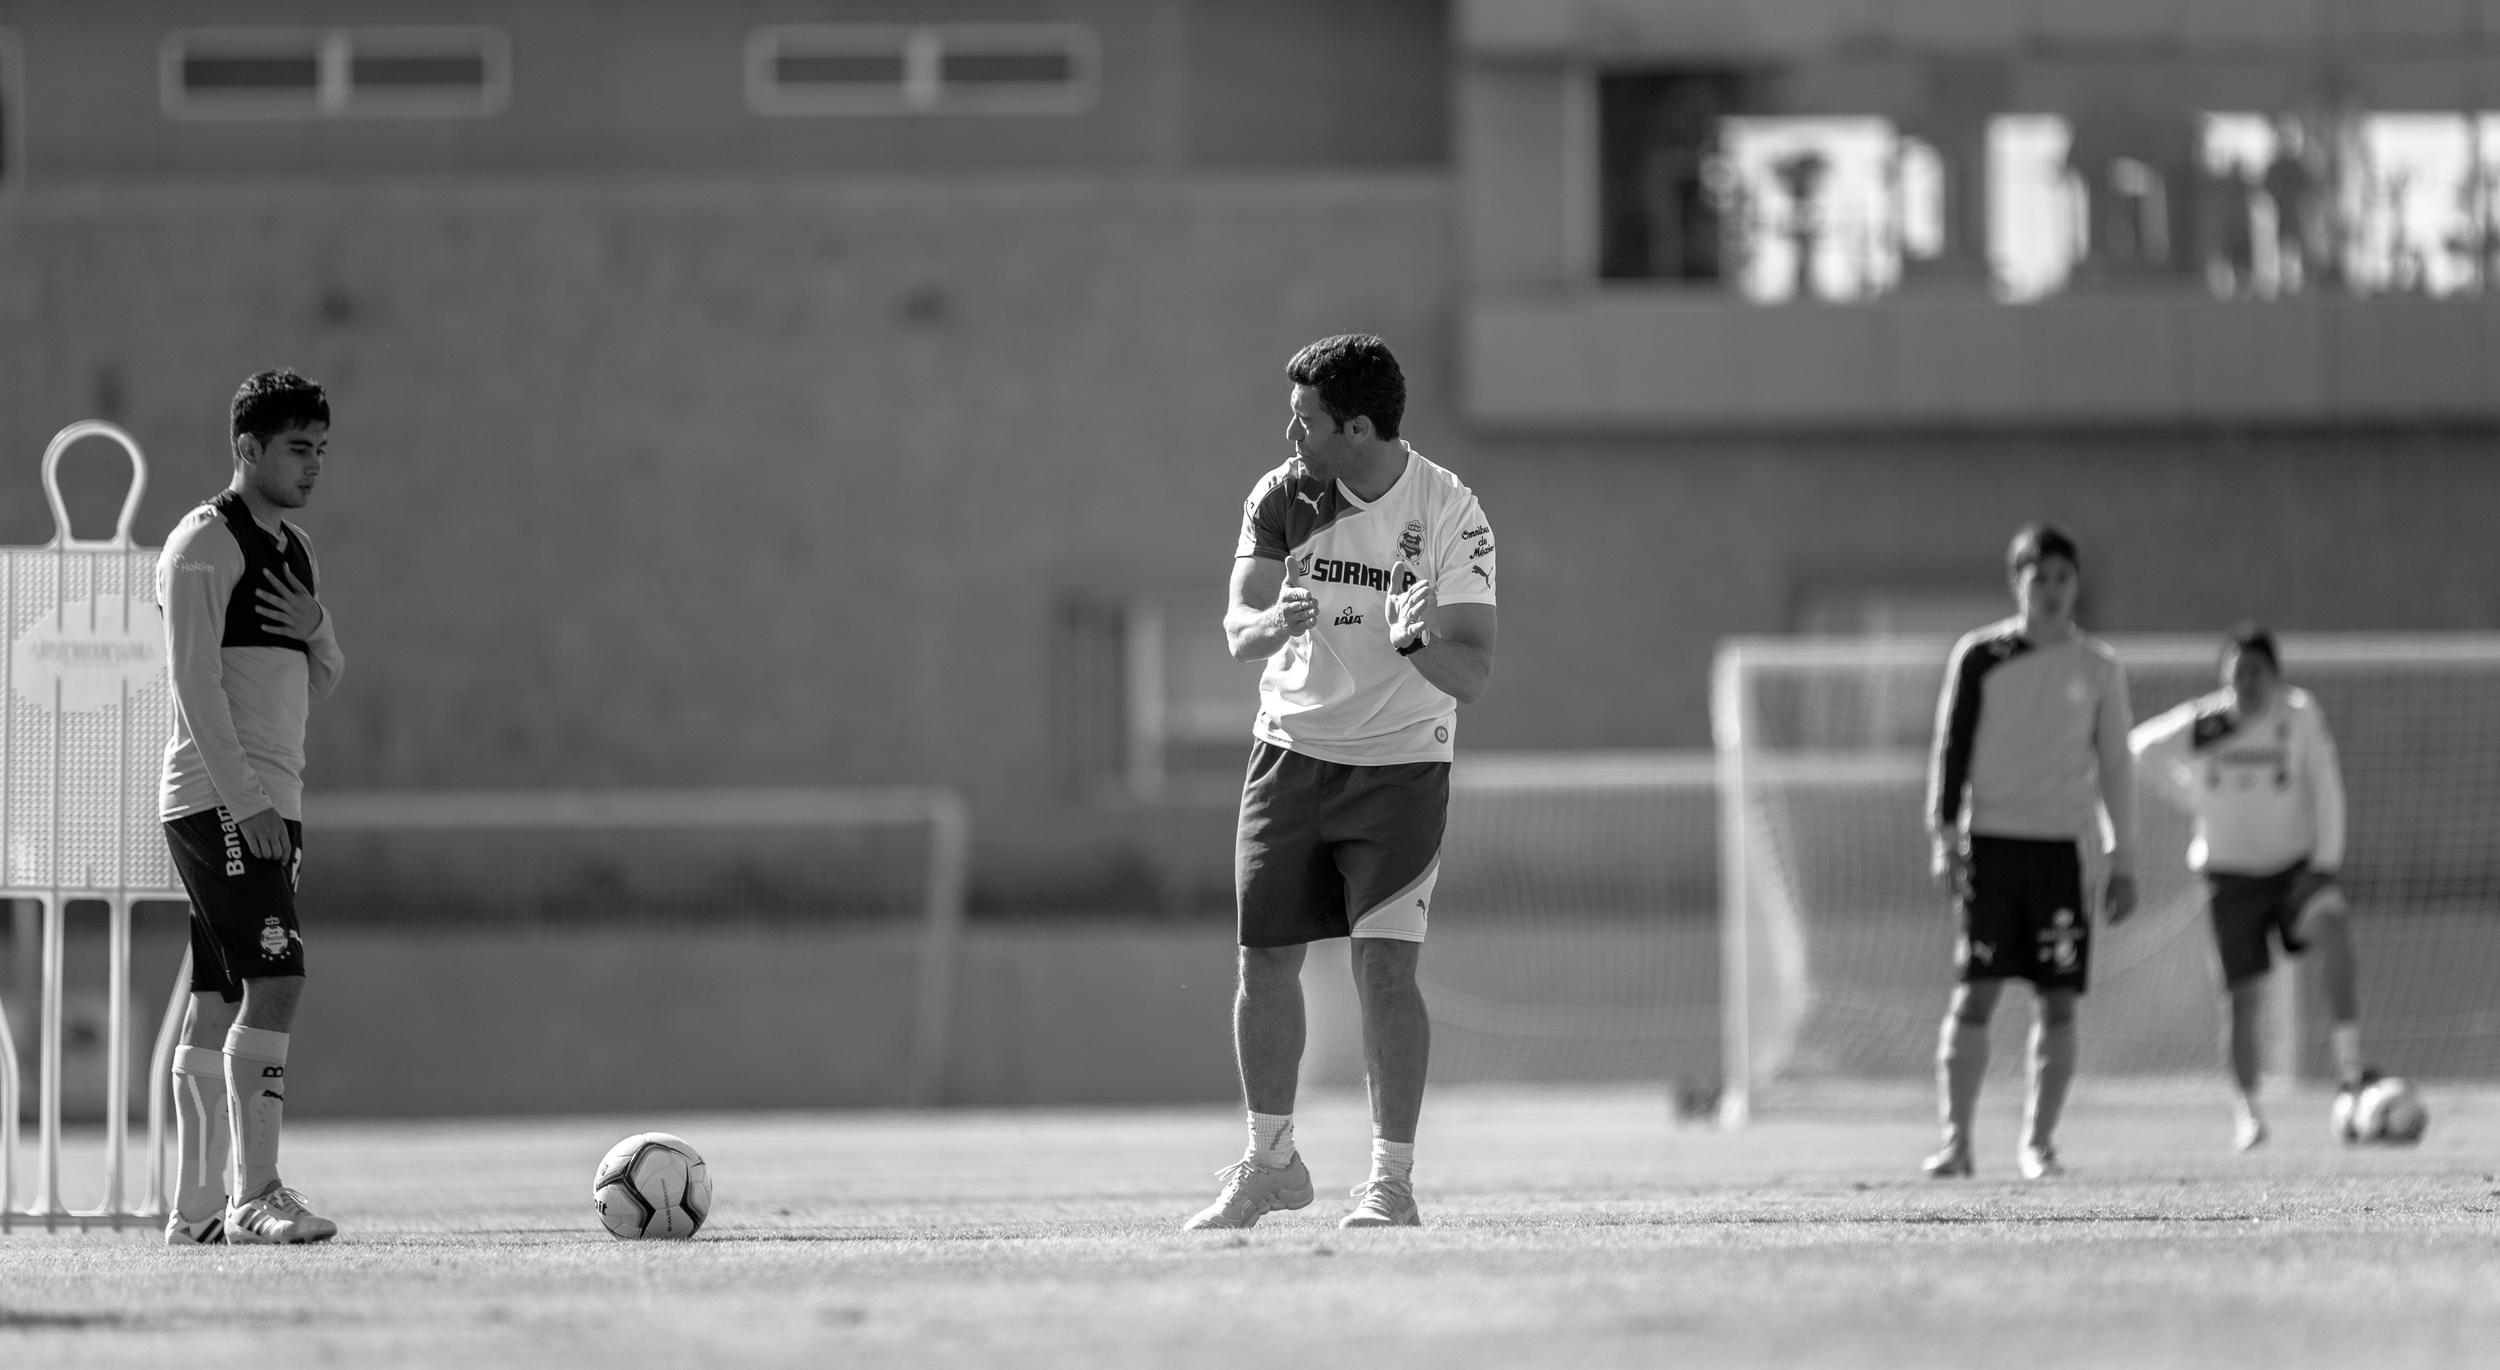 Santos_Laguna_Training_(18_of_23).jpg